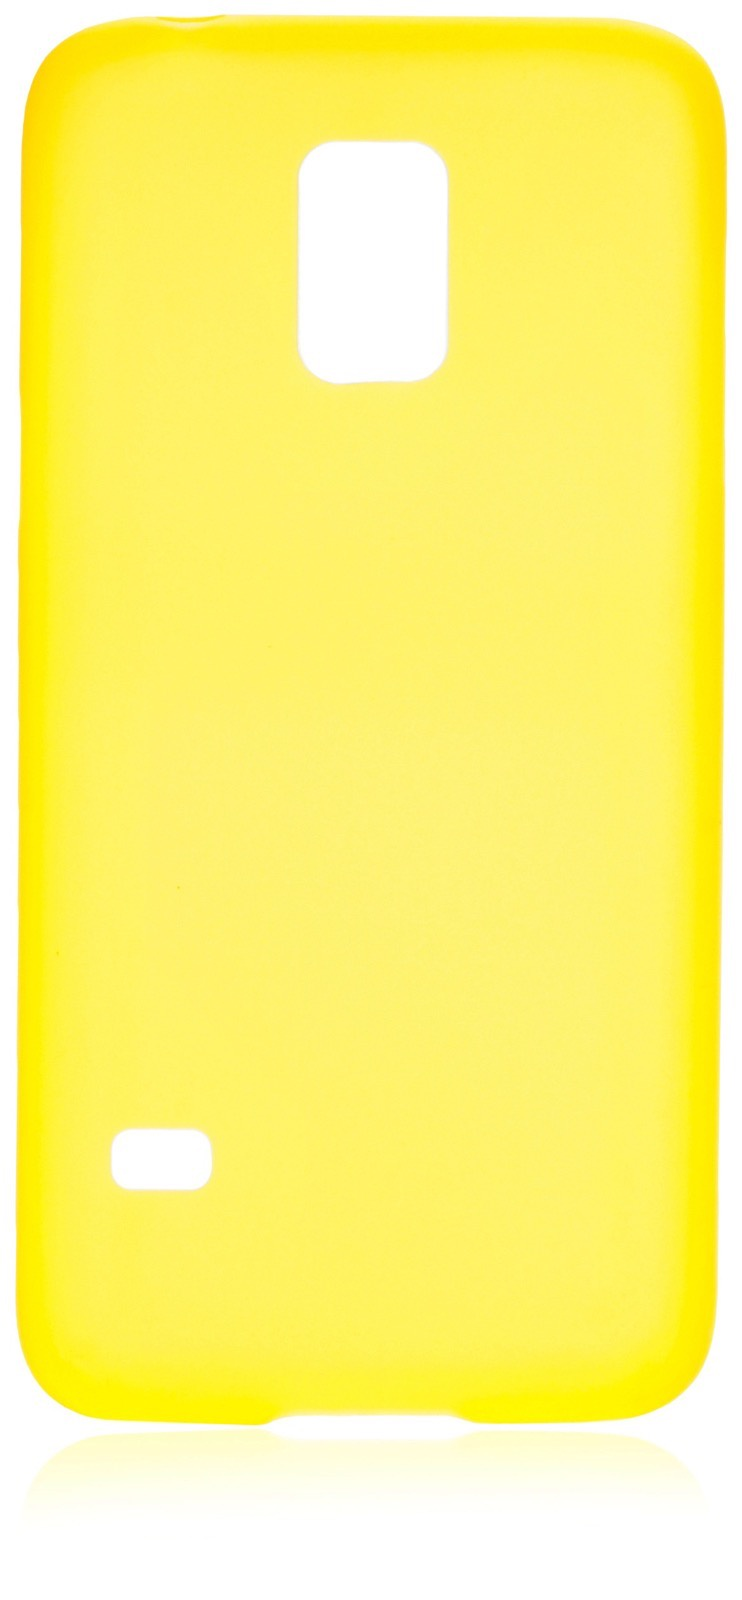 Чехол накладка iNeez пластик 0.3 мм 570001 для Samsung Galaxy S5 mini,570001, желтый